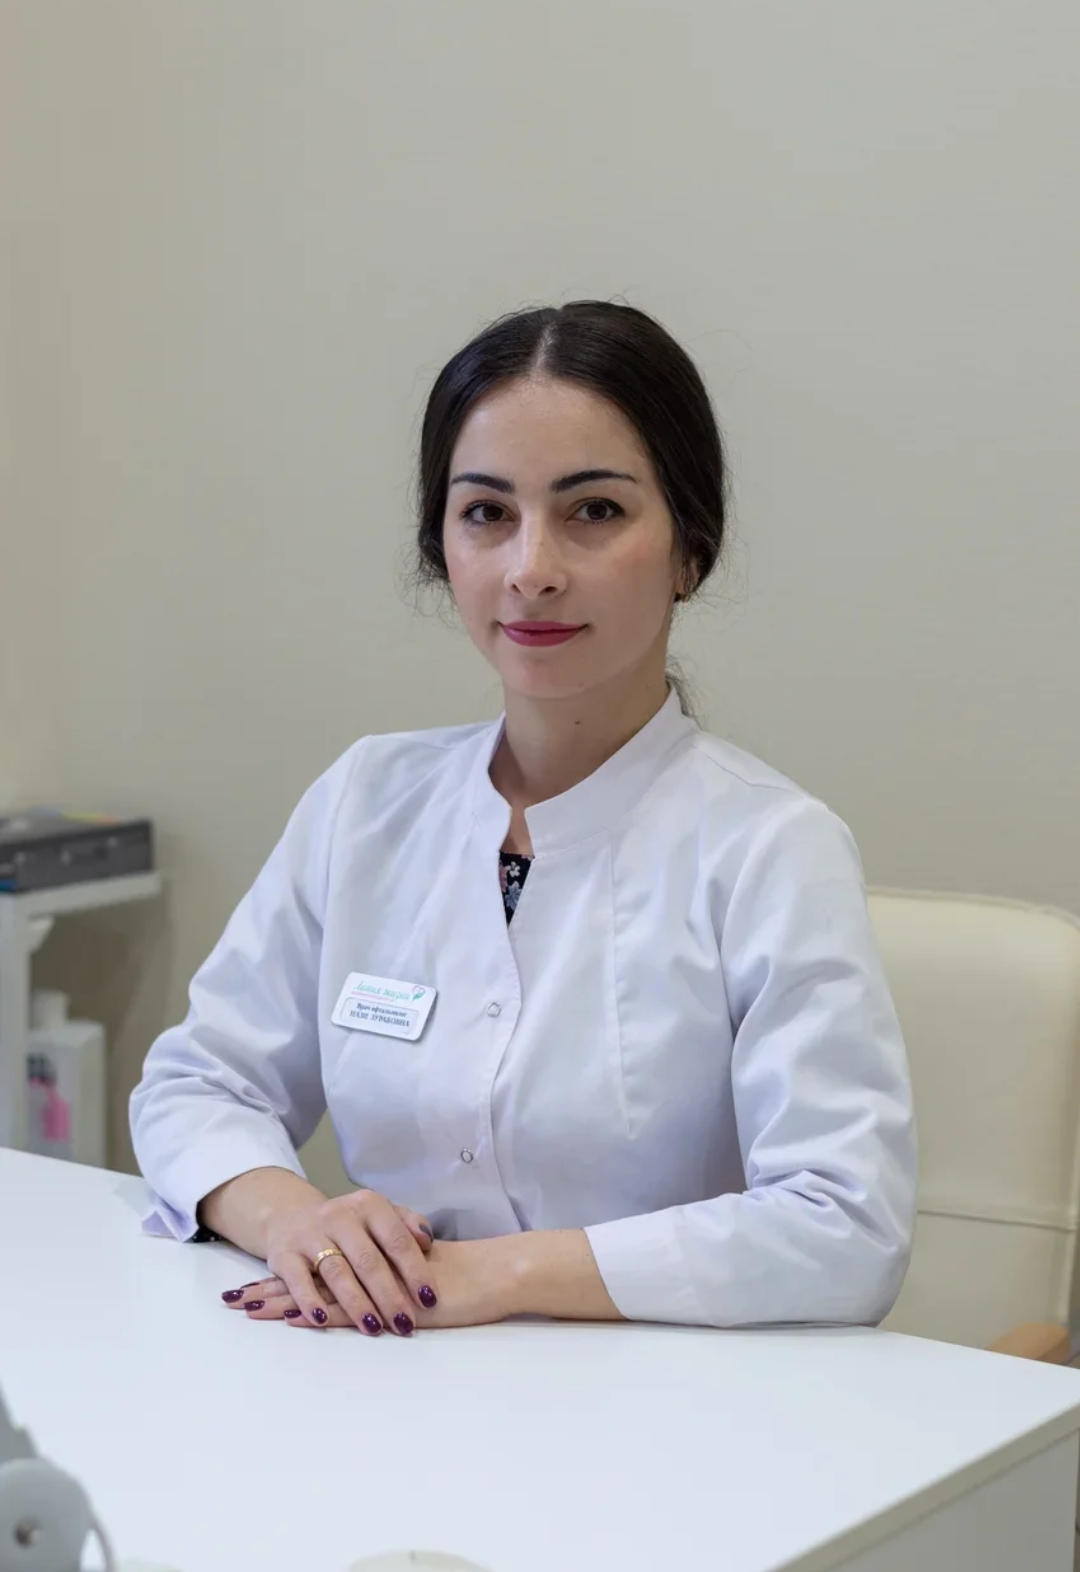 Гигишвили Нази Зурабовна